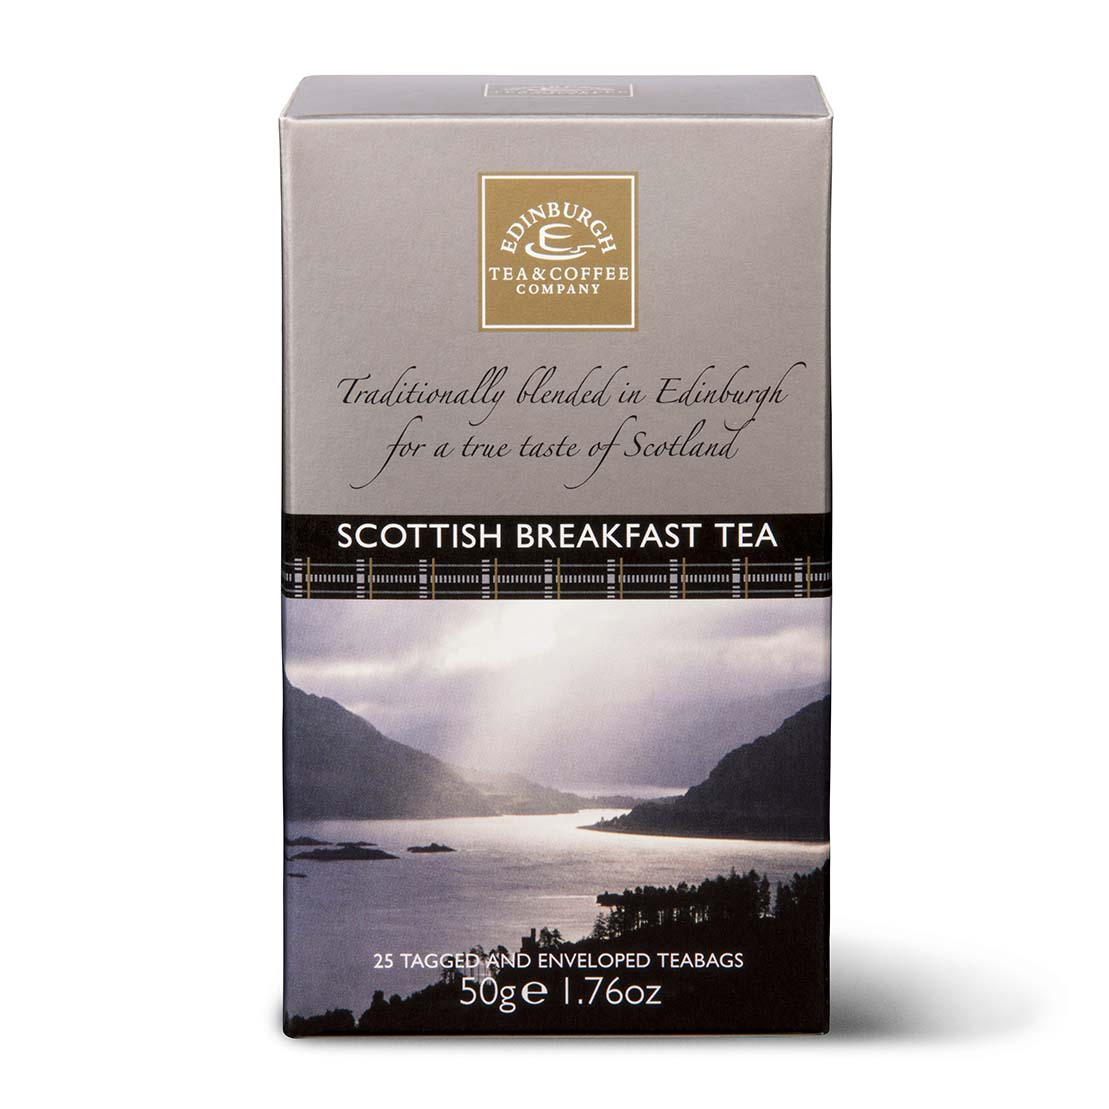 Scottish Breakfast Tea Pack 25 Teabags